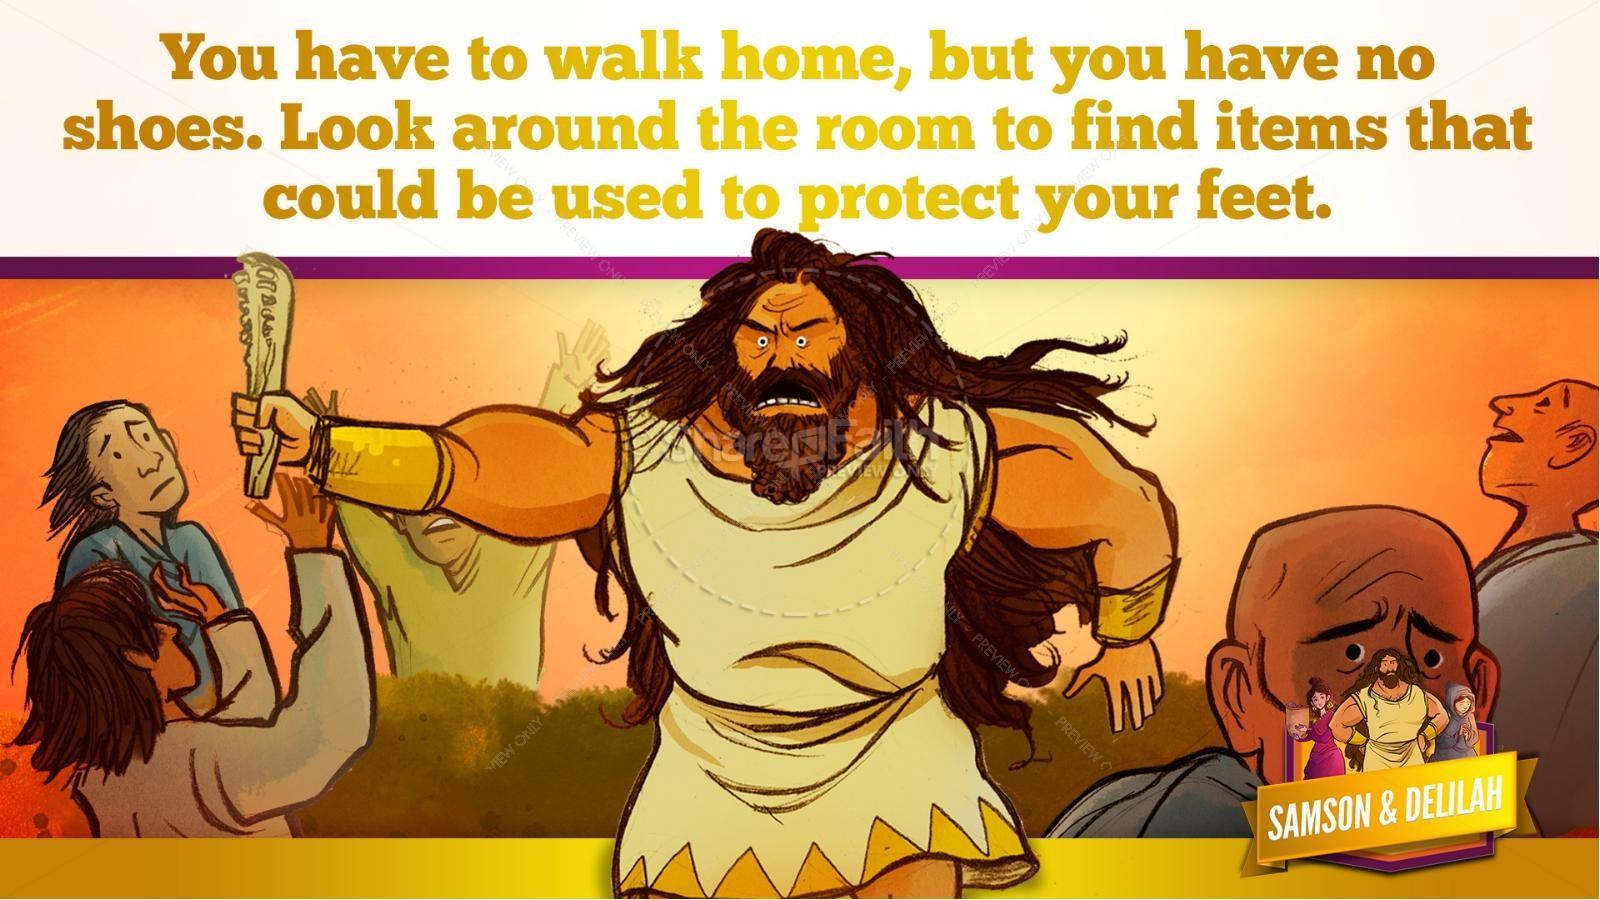 Samson and Delilah Kids Bible Stories | slide 46